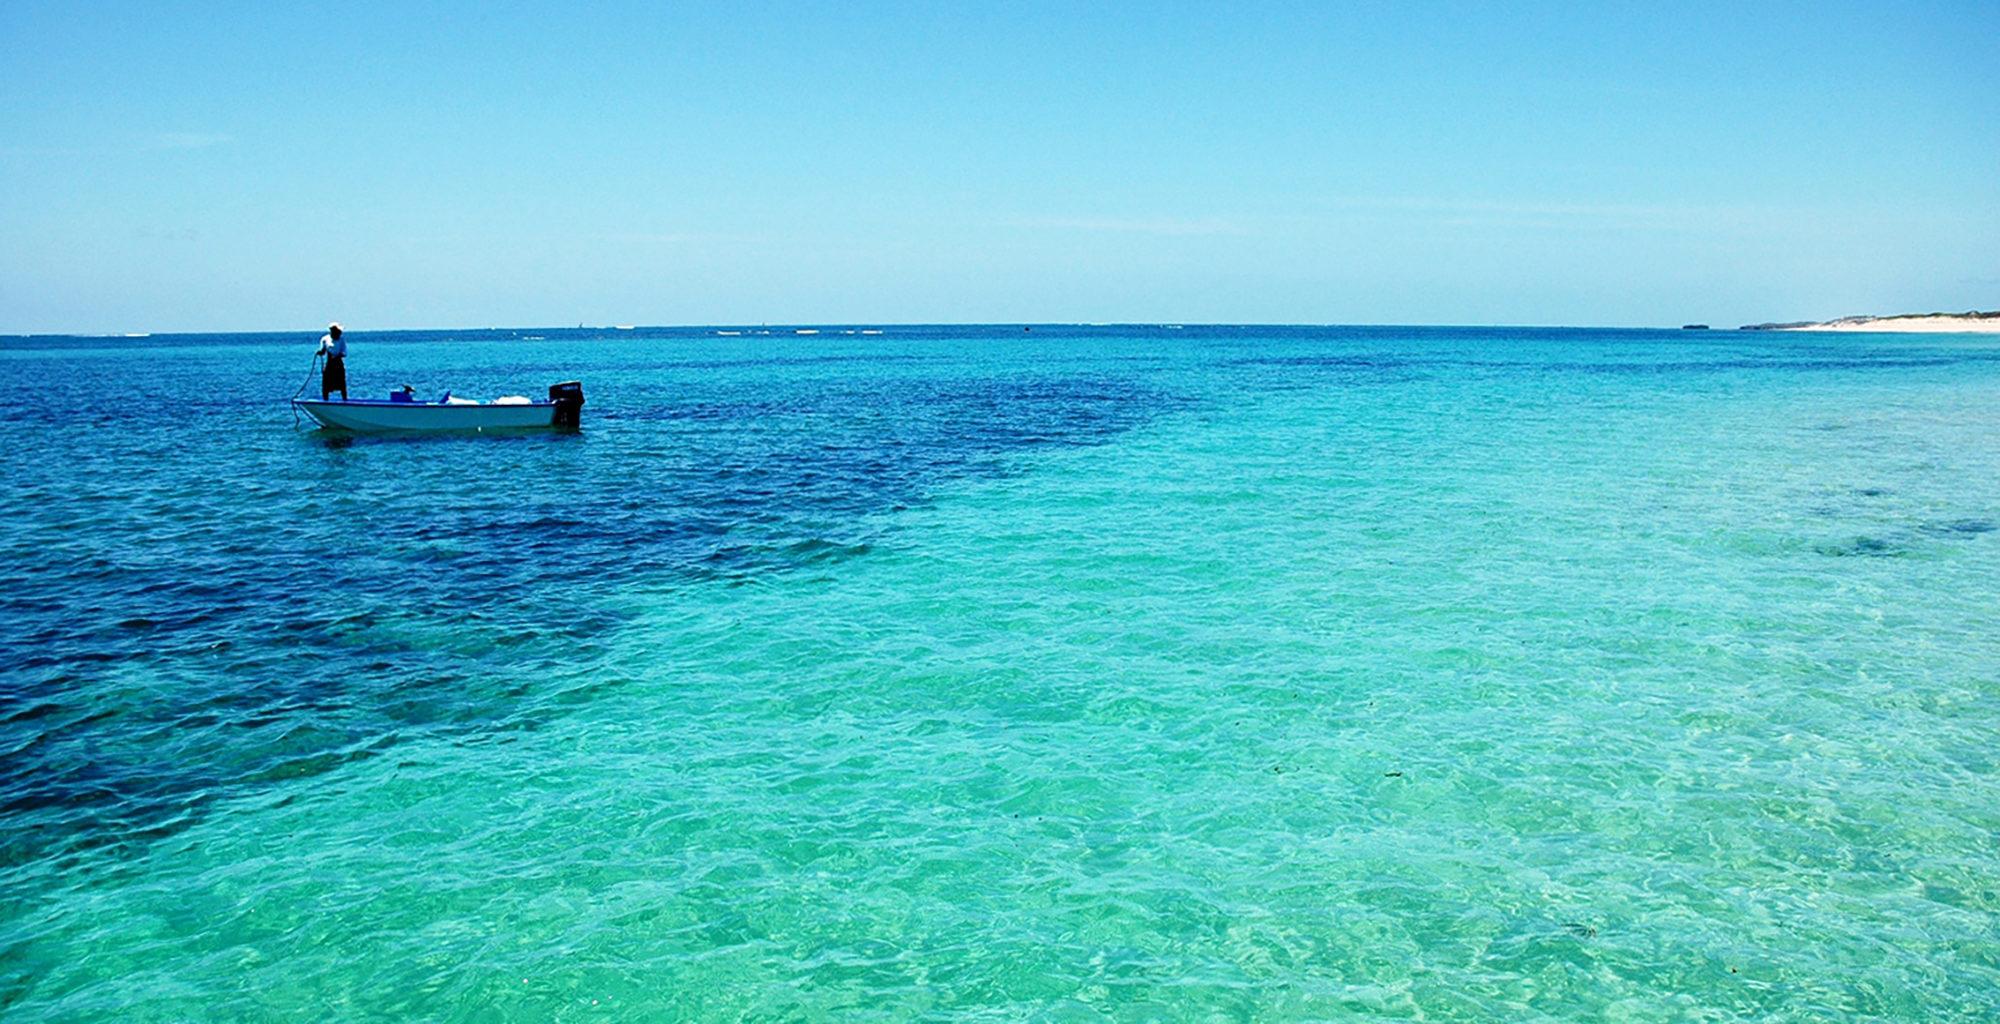 Kenya-Mainland-Coast-Ocean